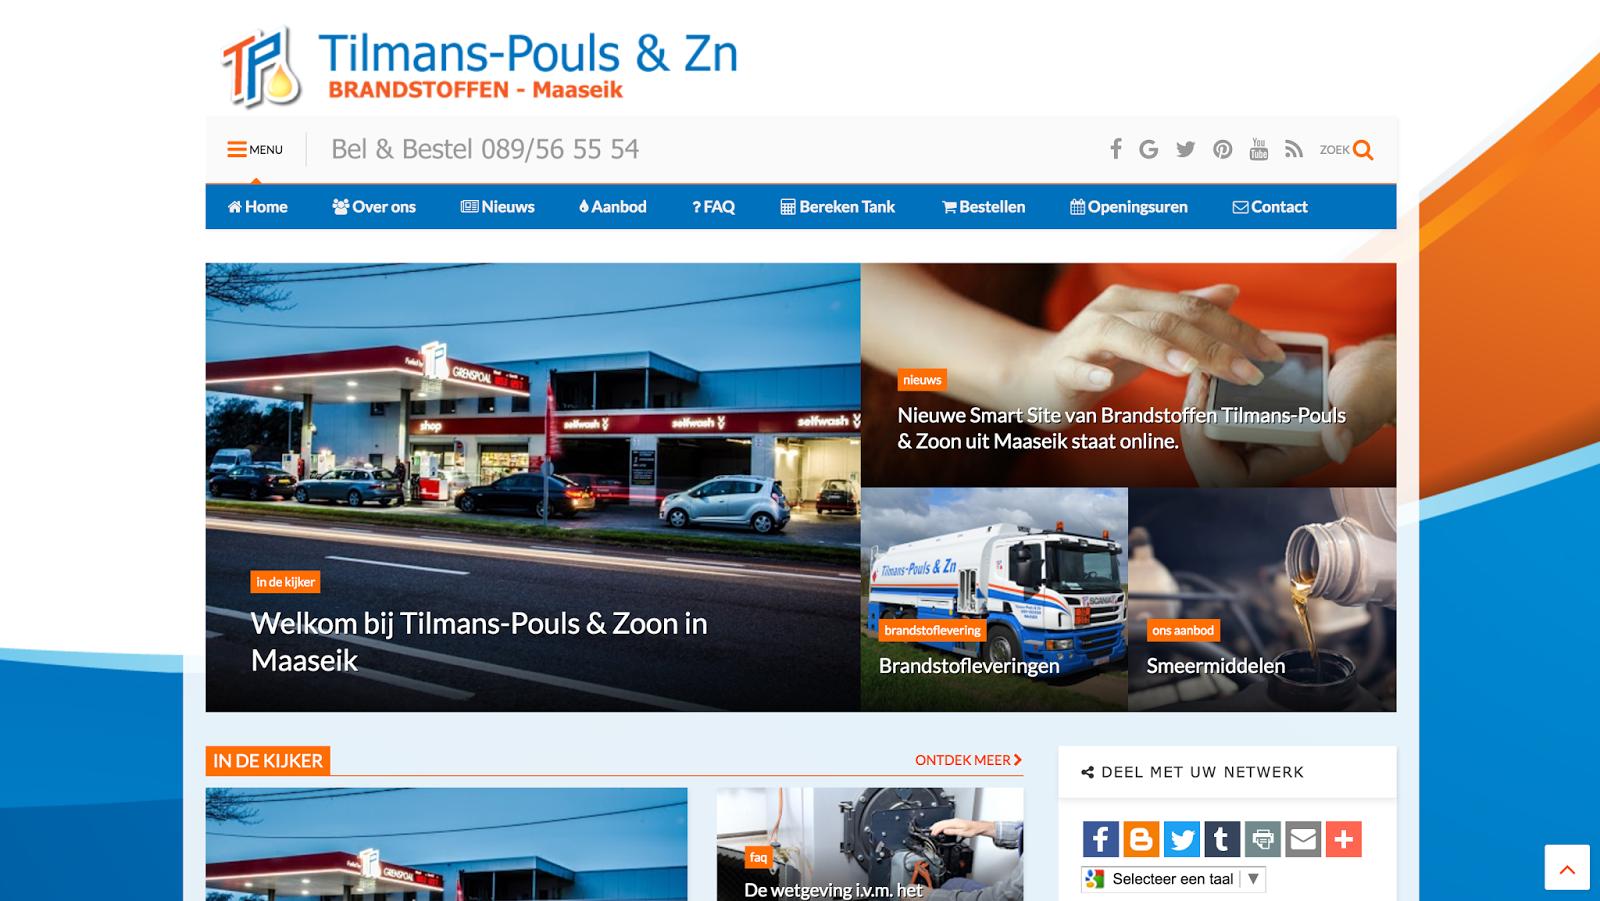 Tilmans-Pouls – brandstoffen – Maaseik